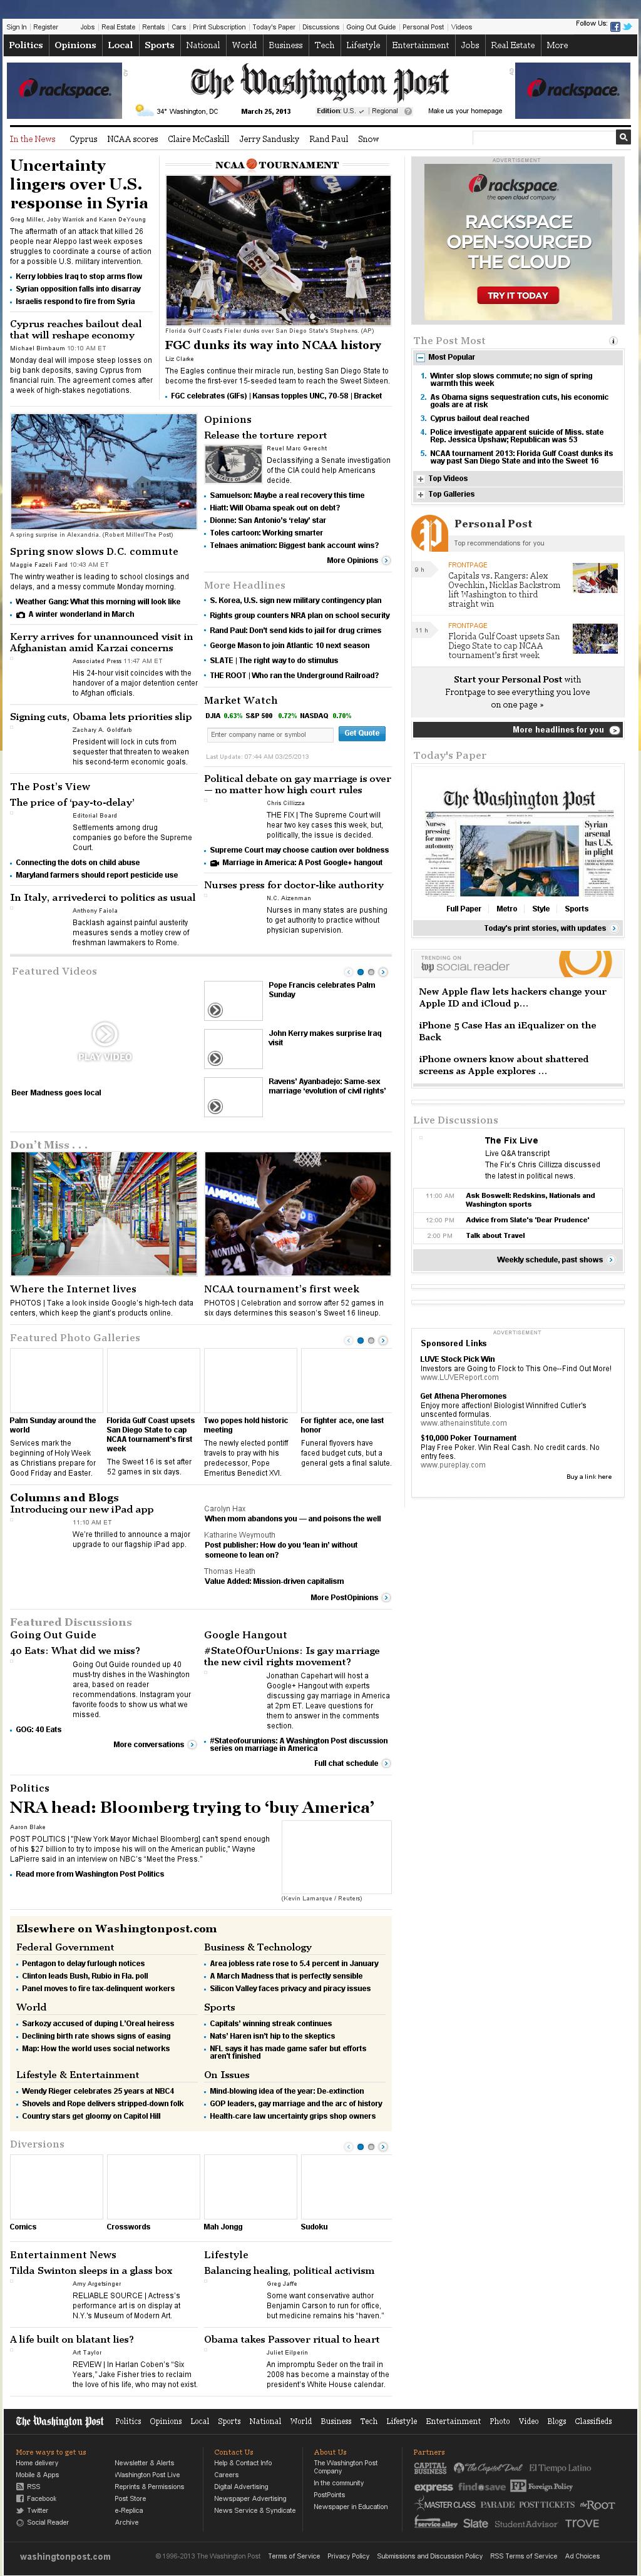 The Washington Post at Monday March 25, 2013, 11:51 a.m. UTC